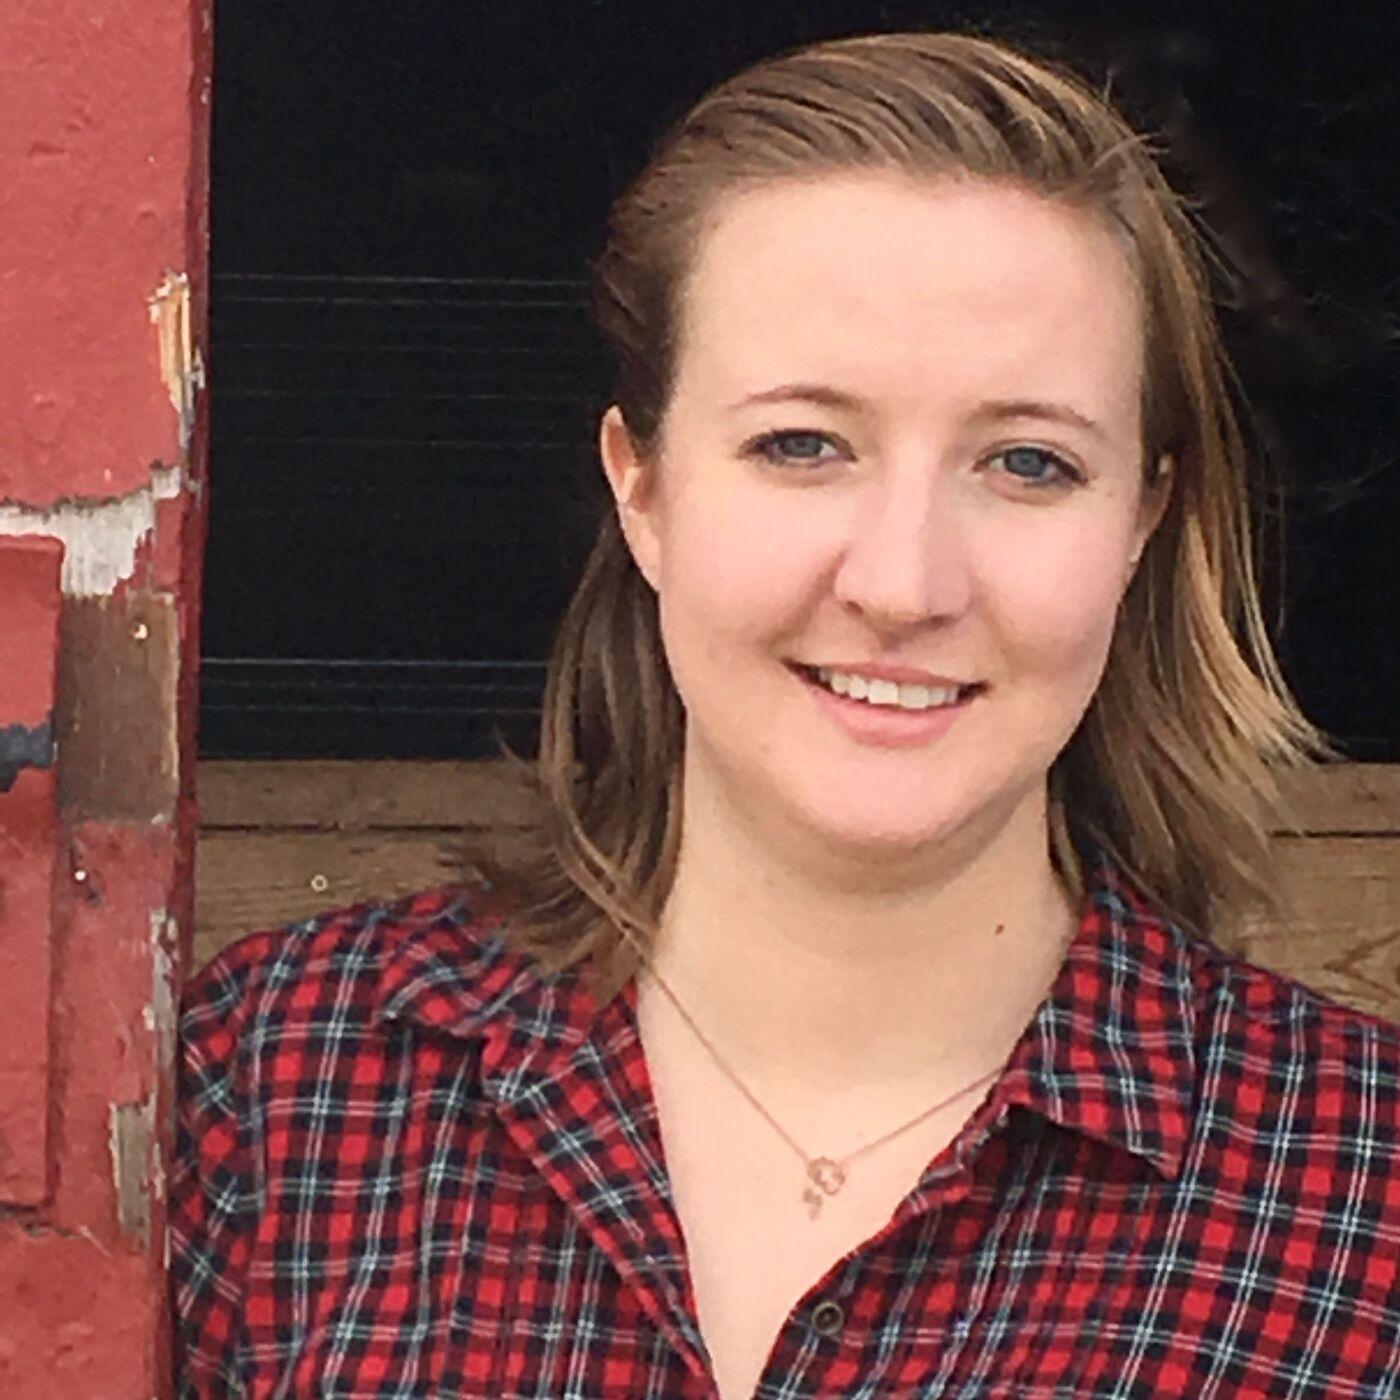 113 Sarah Mock on treating farms like businesses